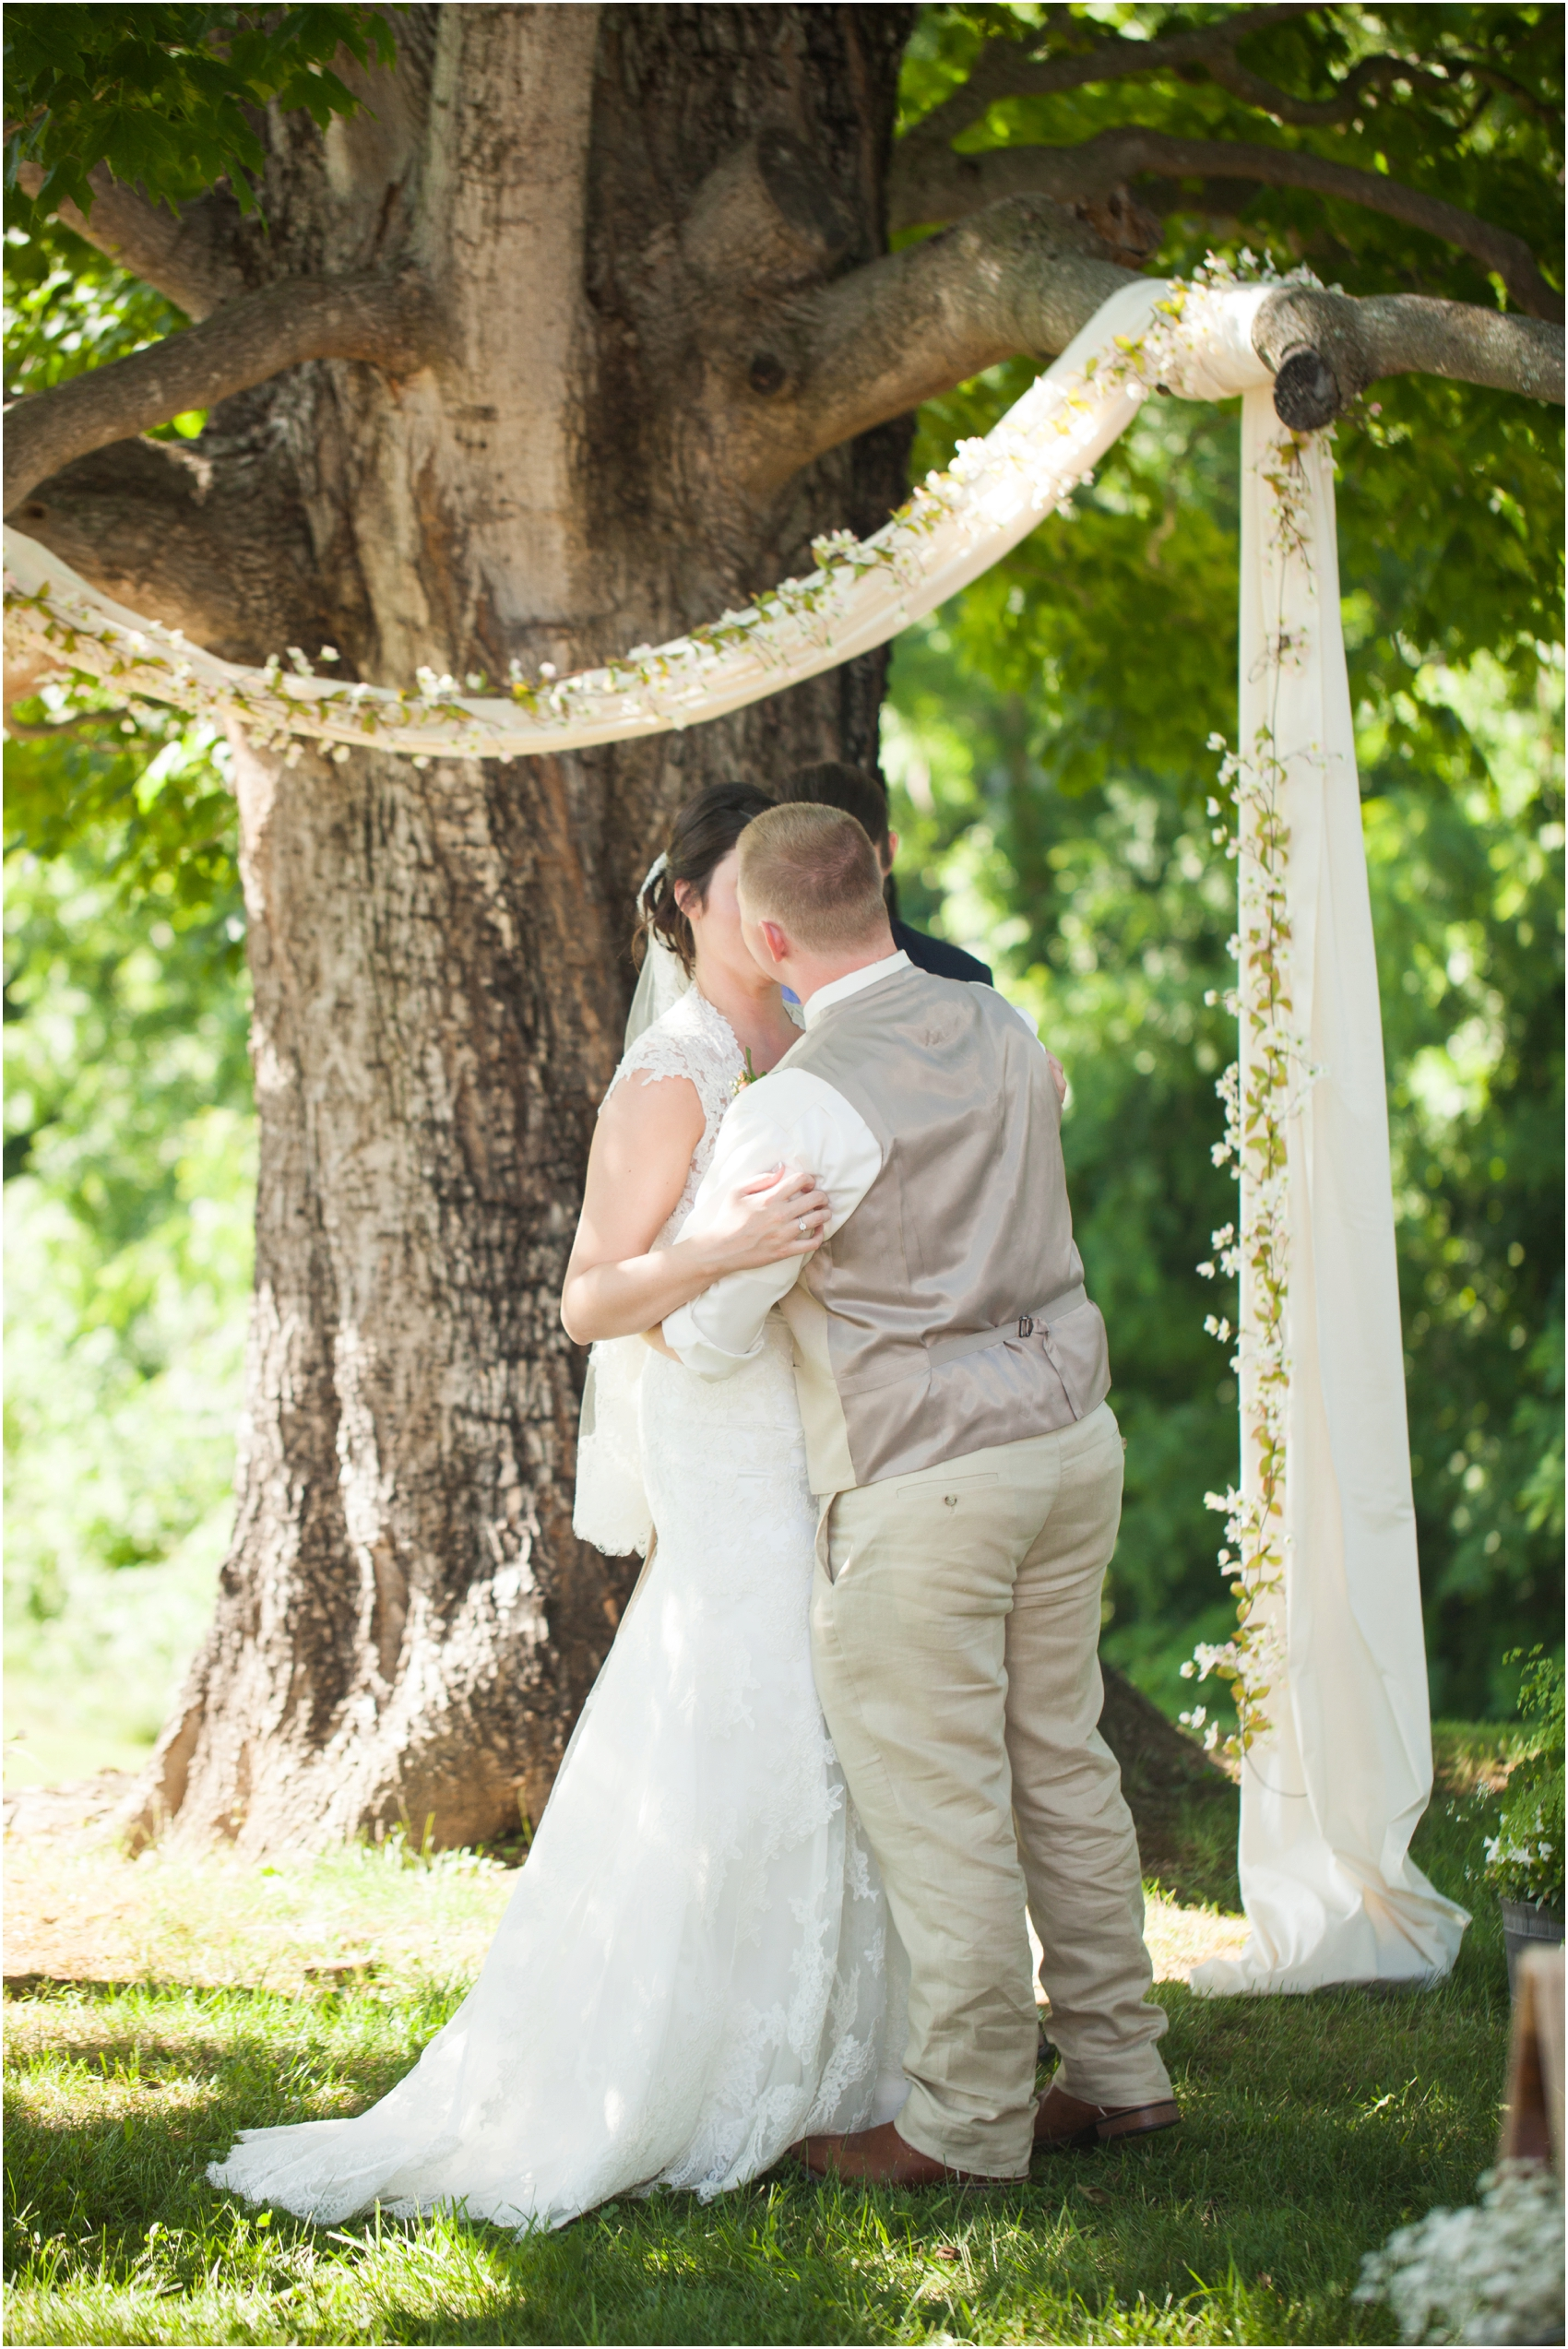 Rodes Farm Charlottesville VA Wedding-2-4.jpg